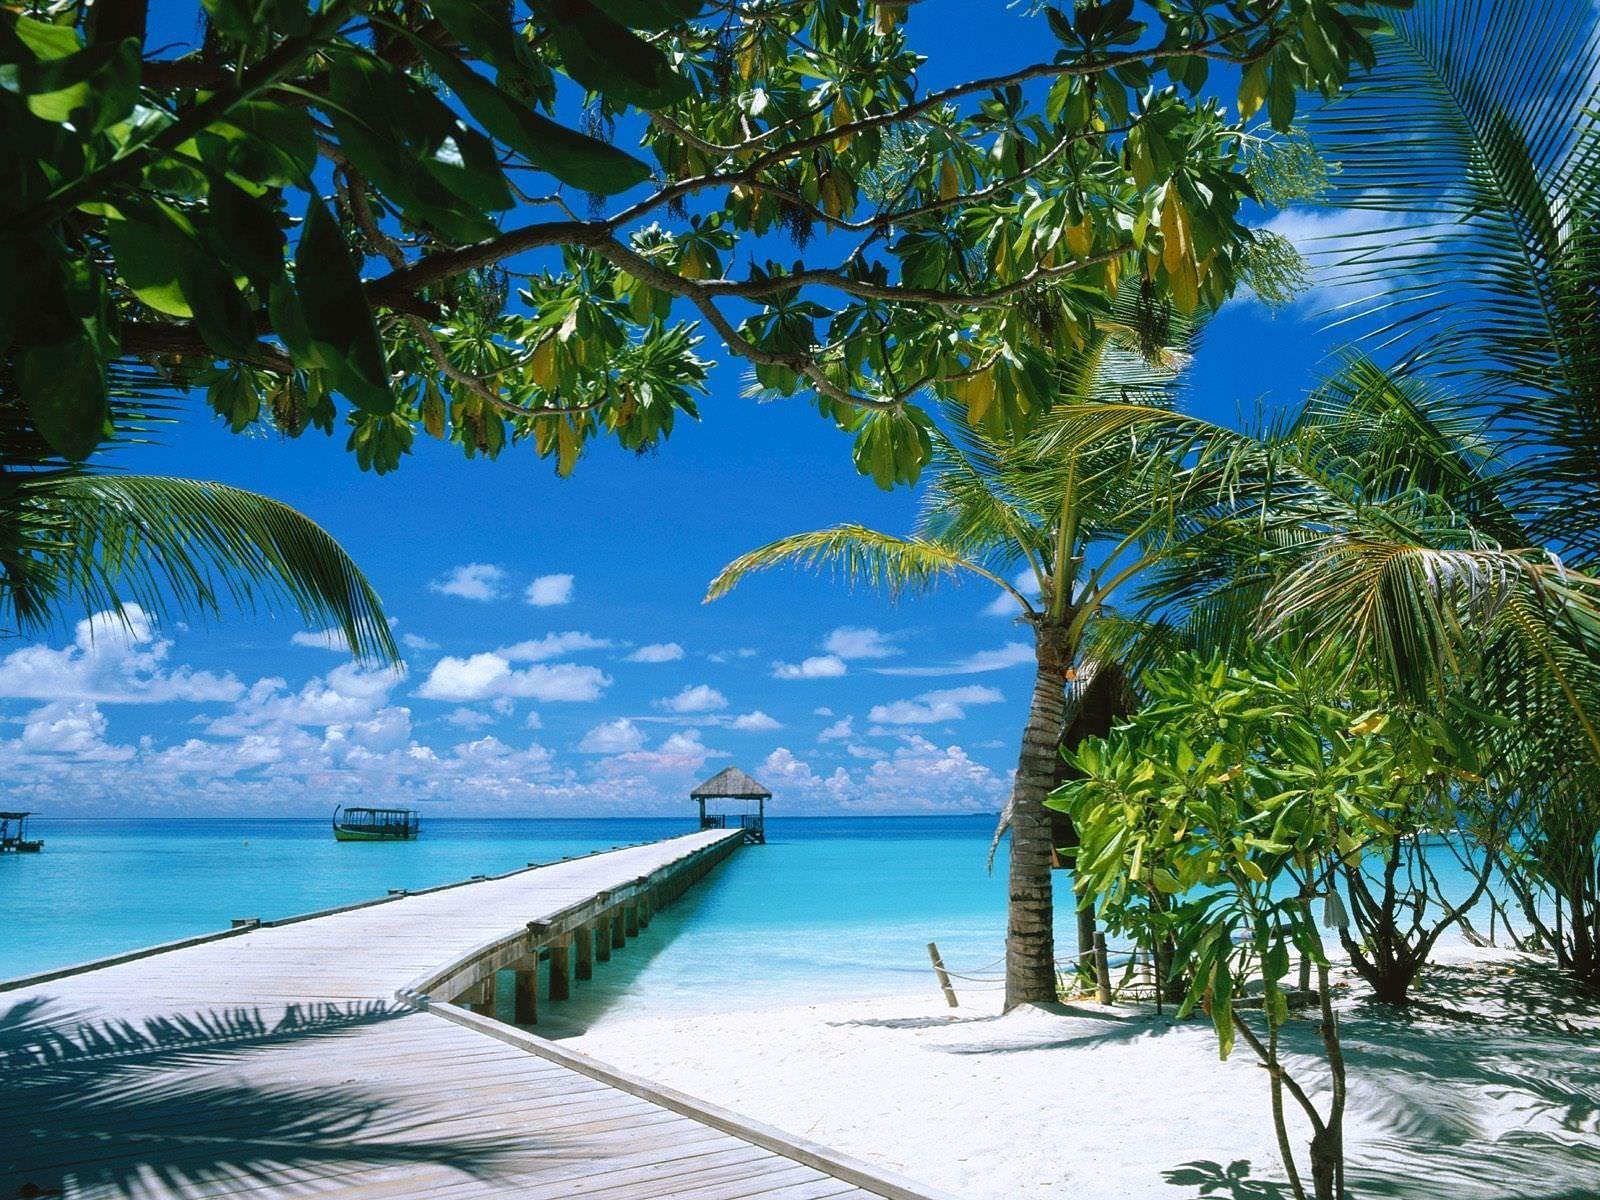 Long Way To Bay Tropical Island Wallpaper